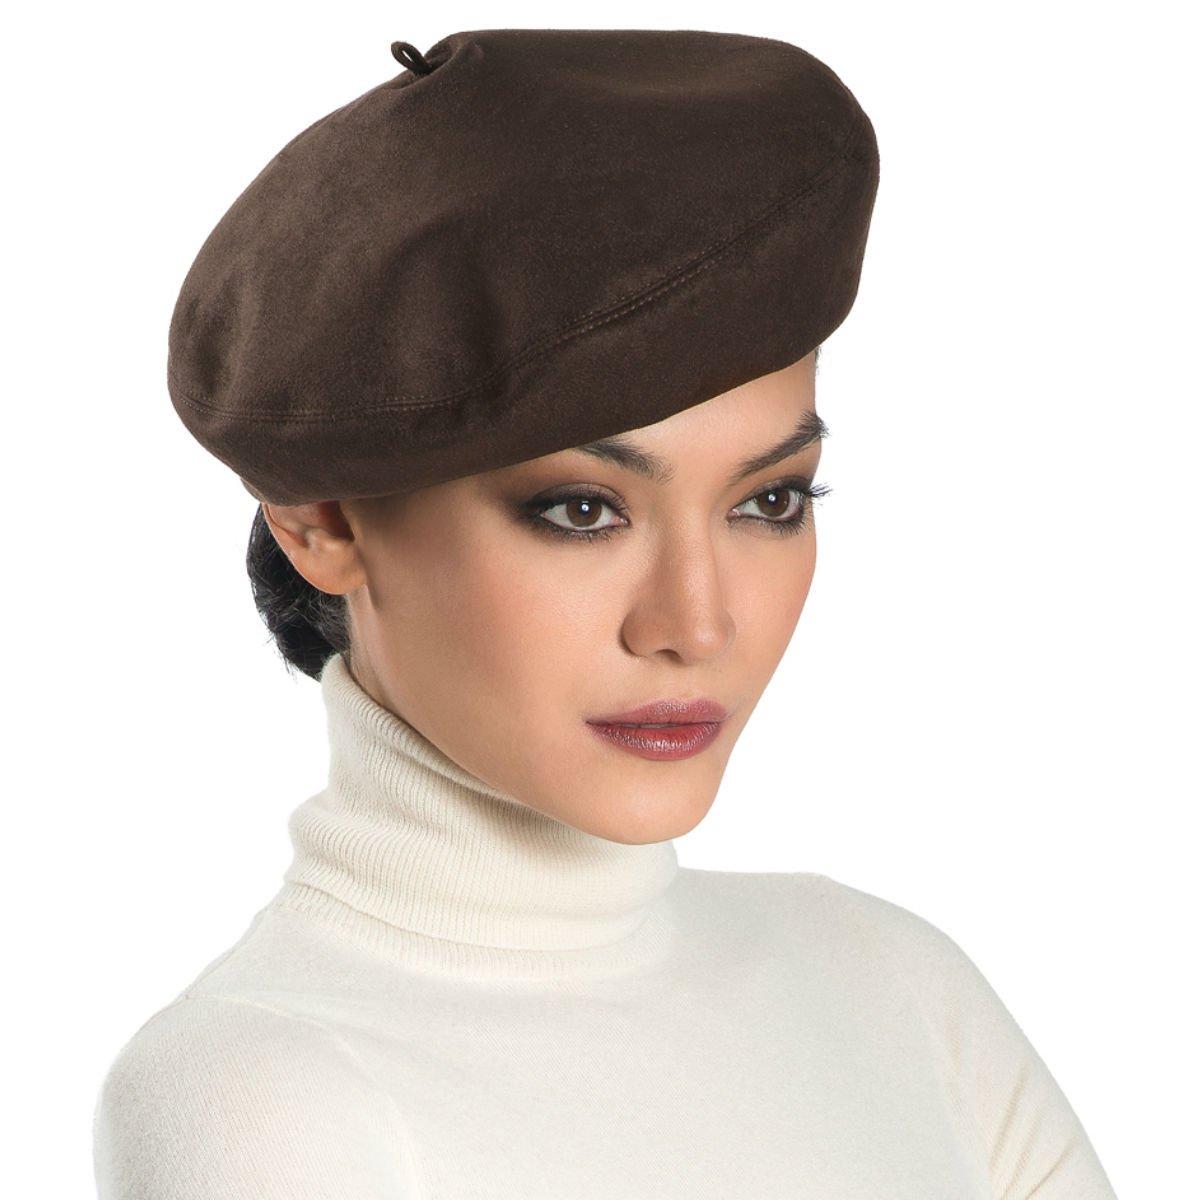 Eric Javits Luxury Fashion Designer Women's Headwear Hat - Betty - Brown by Eric Javits